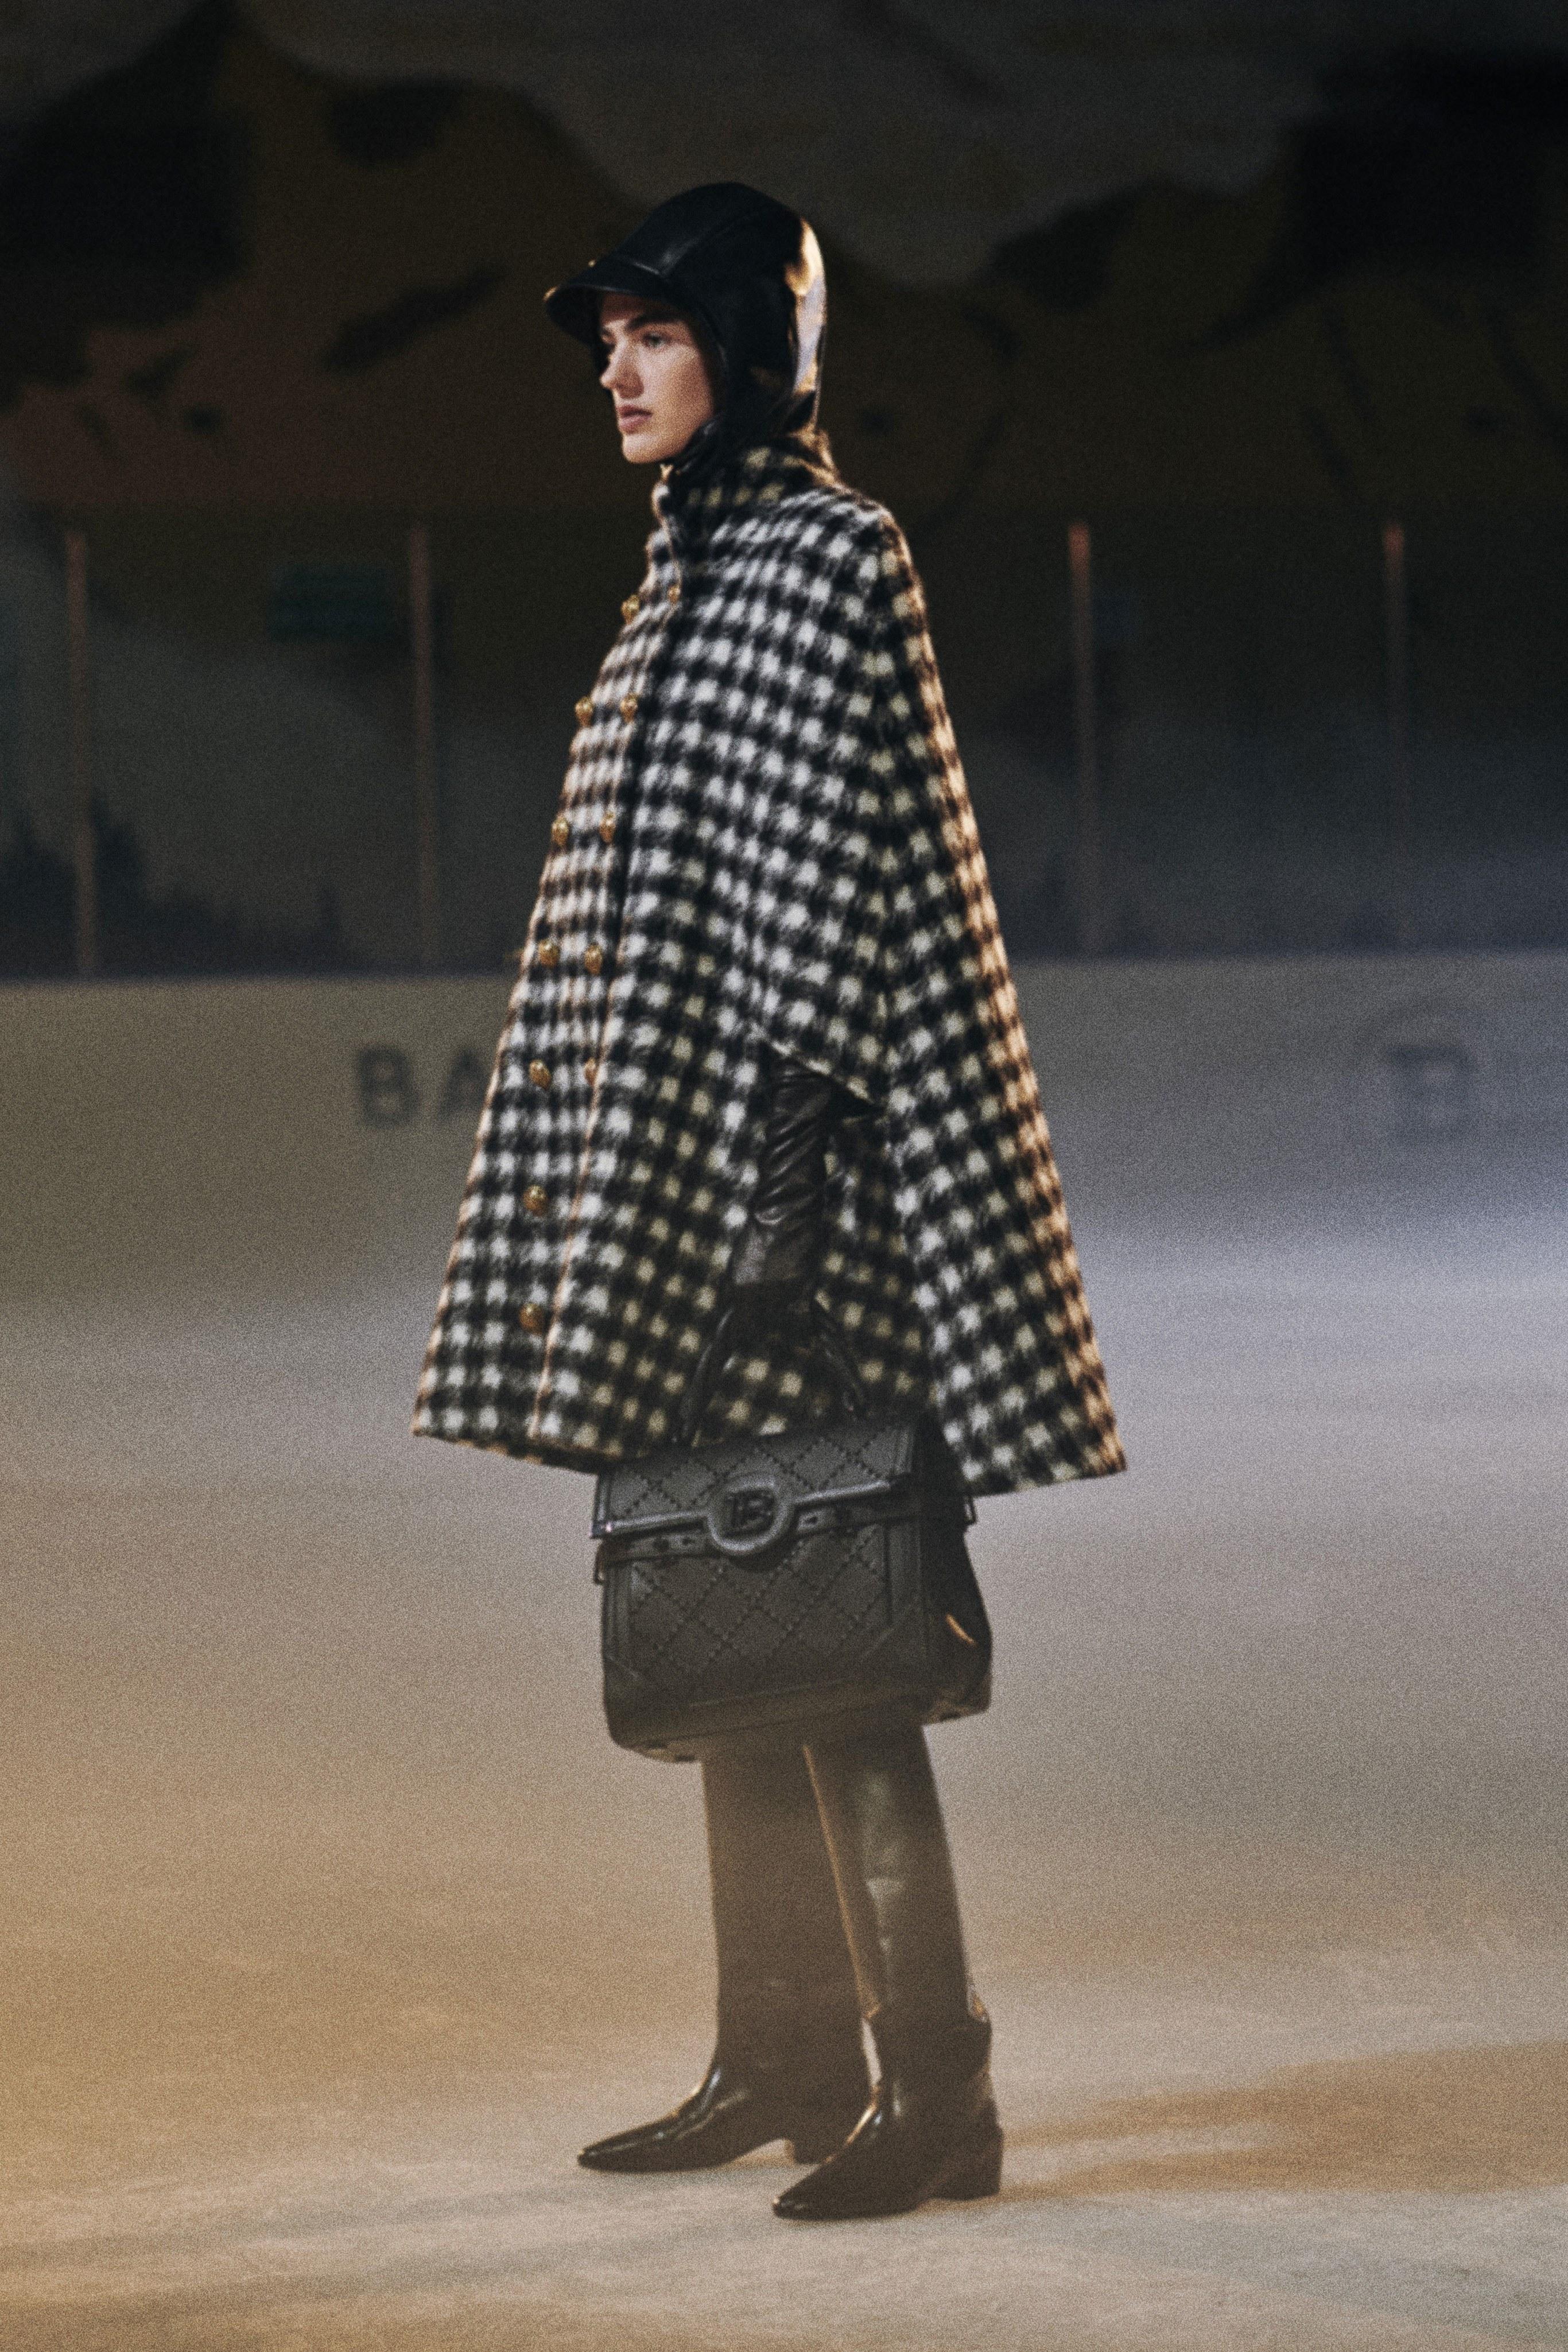 Савхин пиджак, макси юбка болон бусад дурсамж сэргээсэн 2020 оны ретро трендүүд (фото 14)